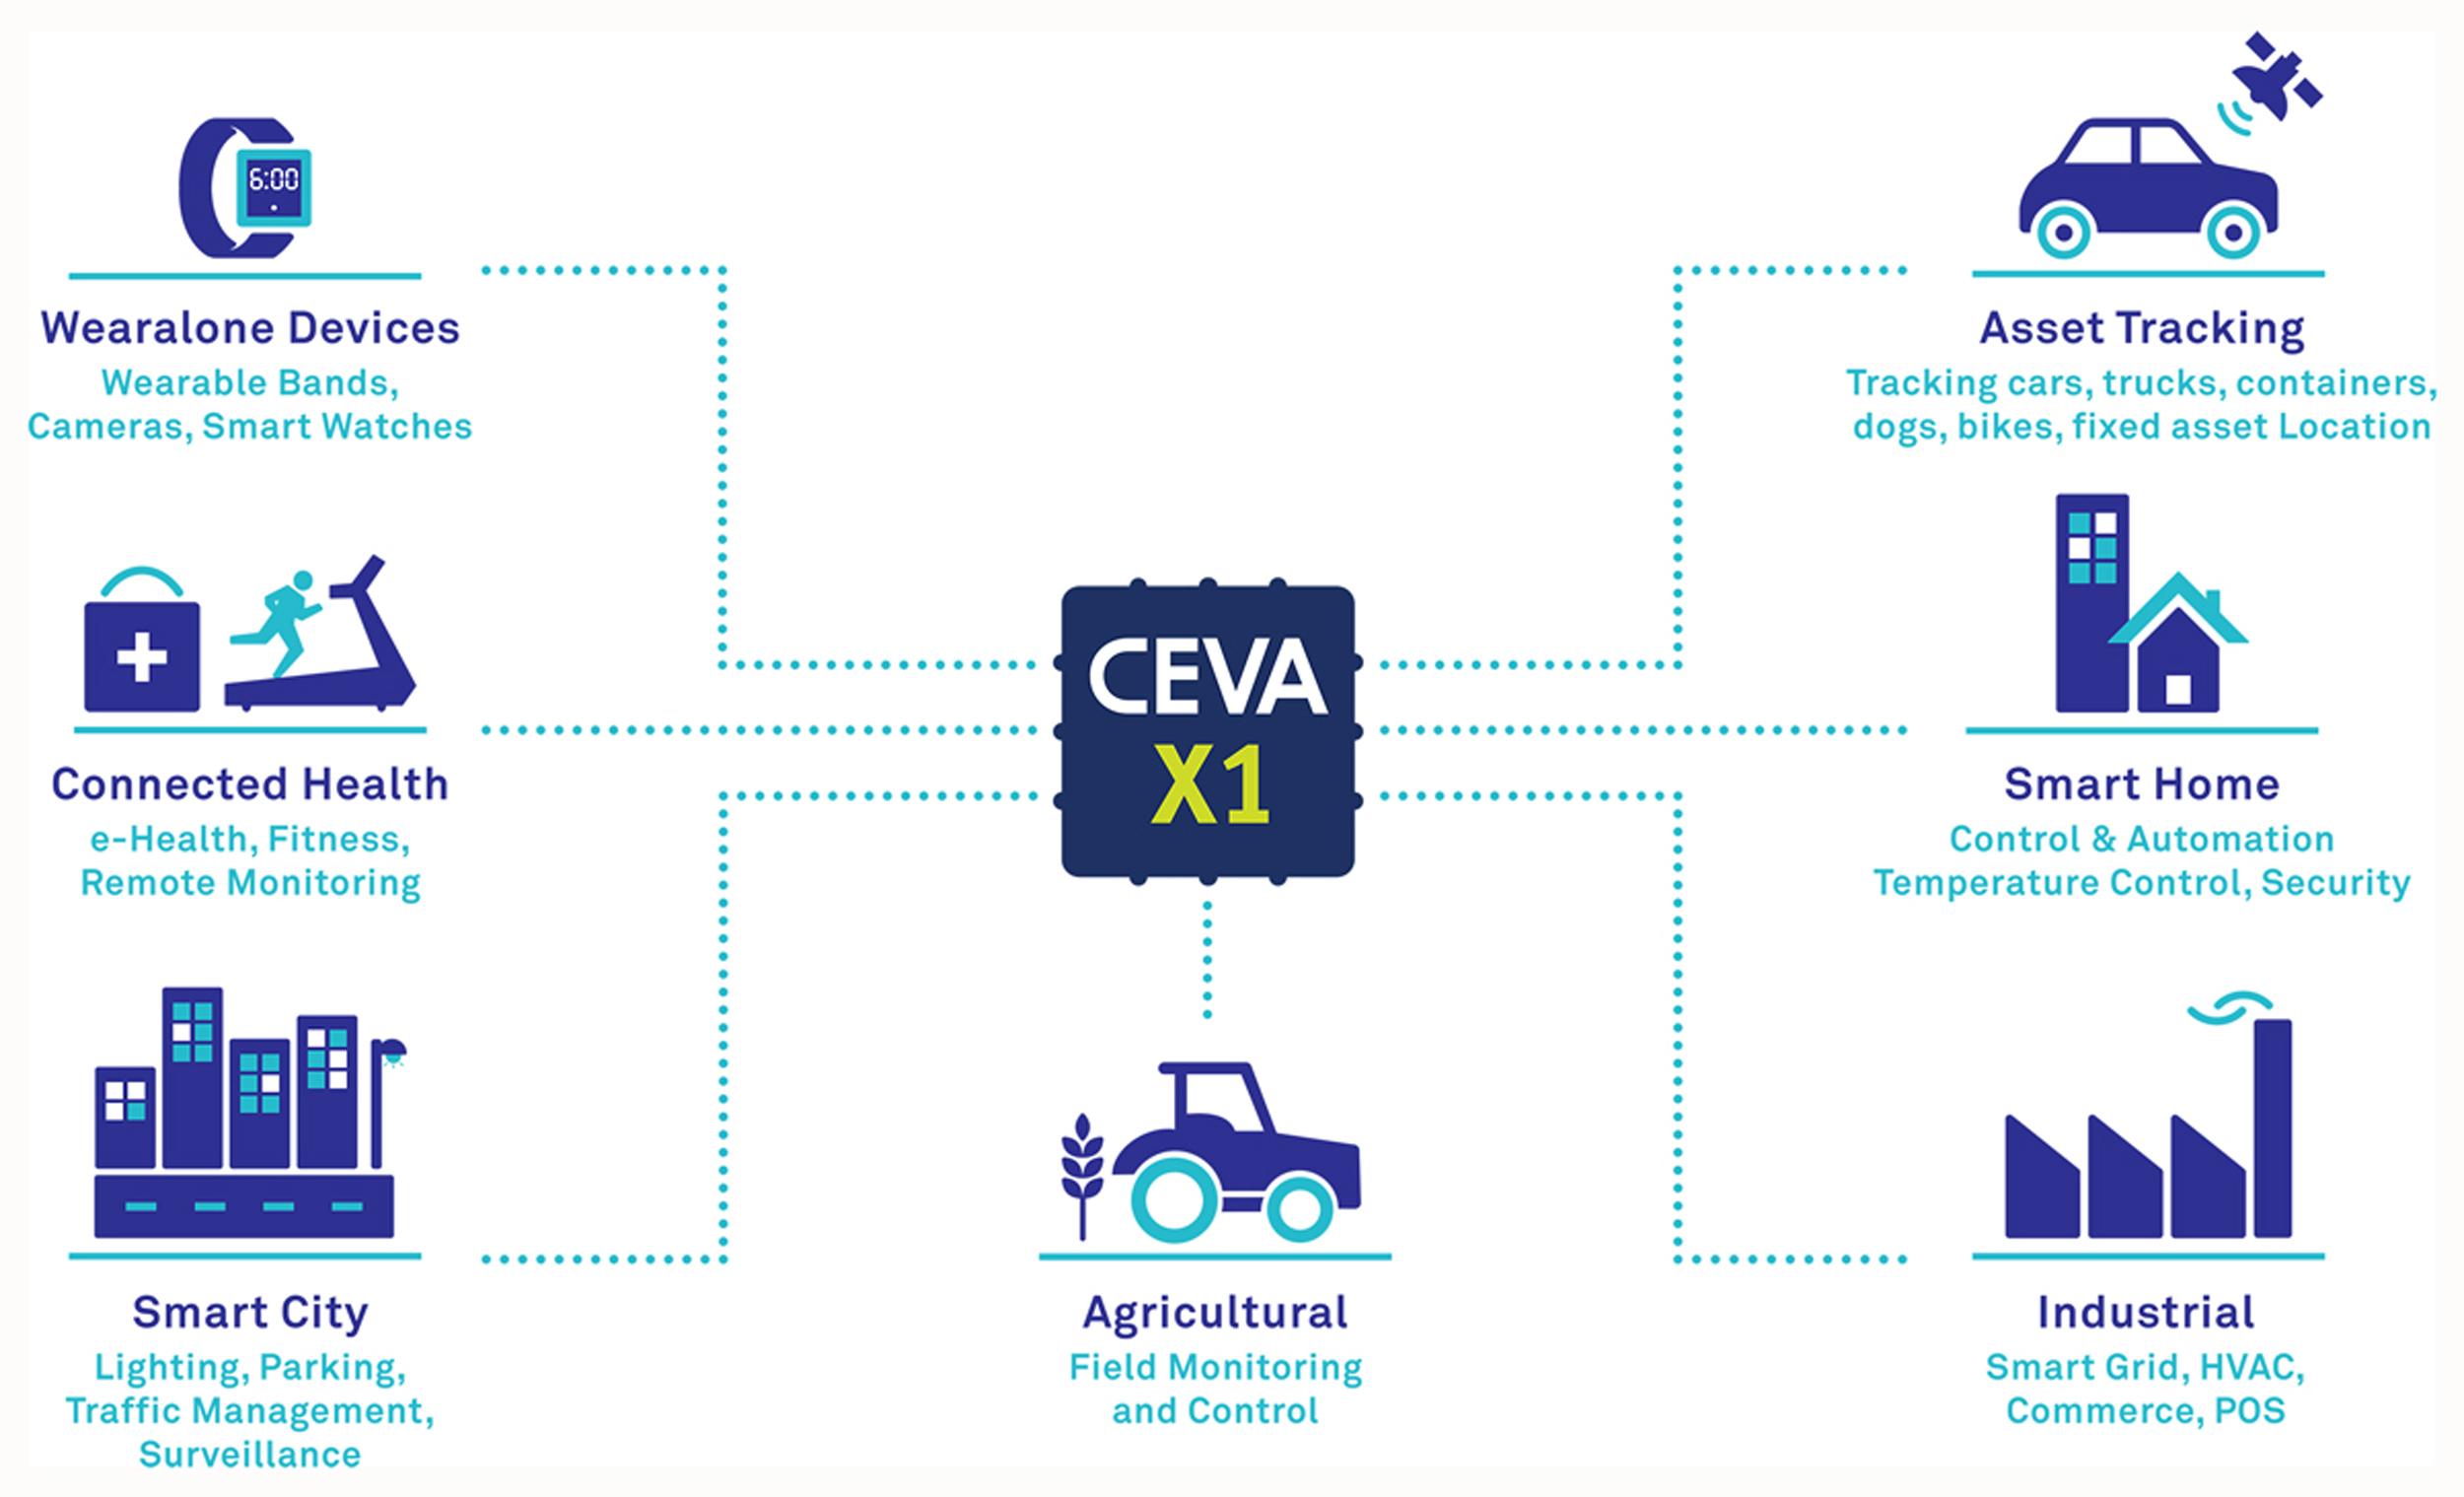 CEV112 CEVA-X1 TargetMarkets